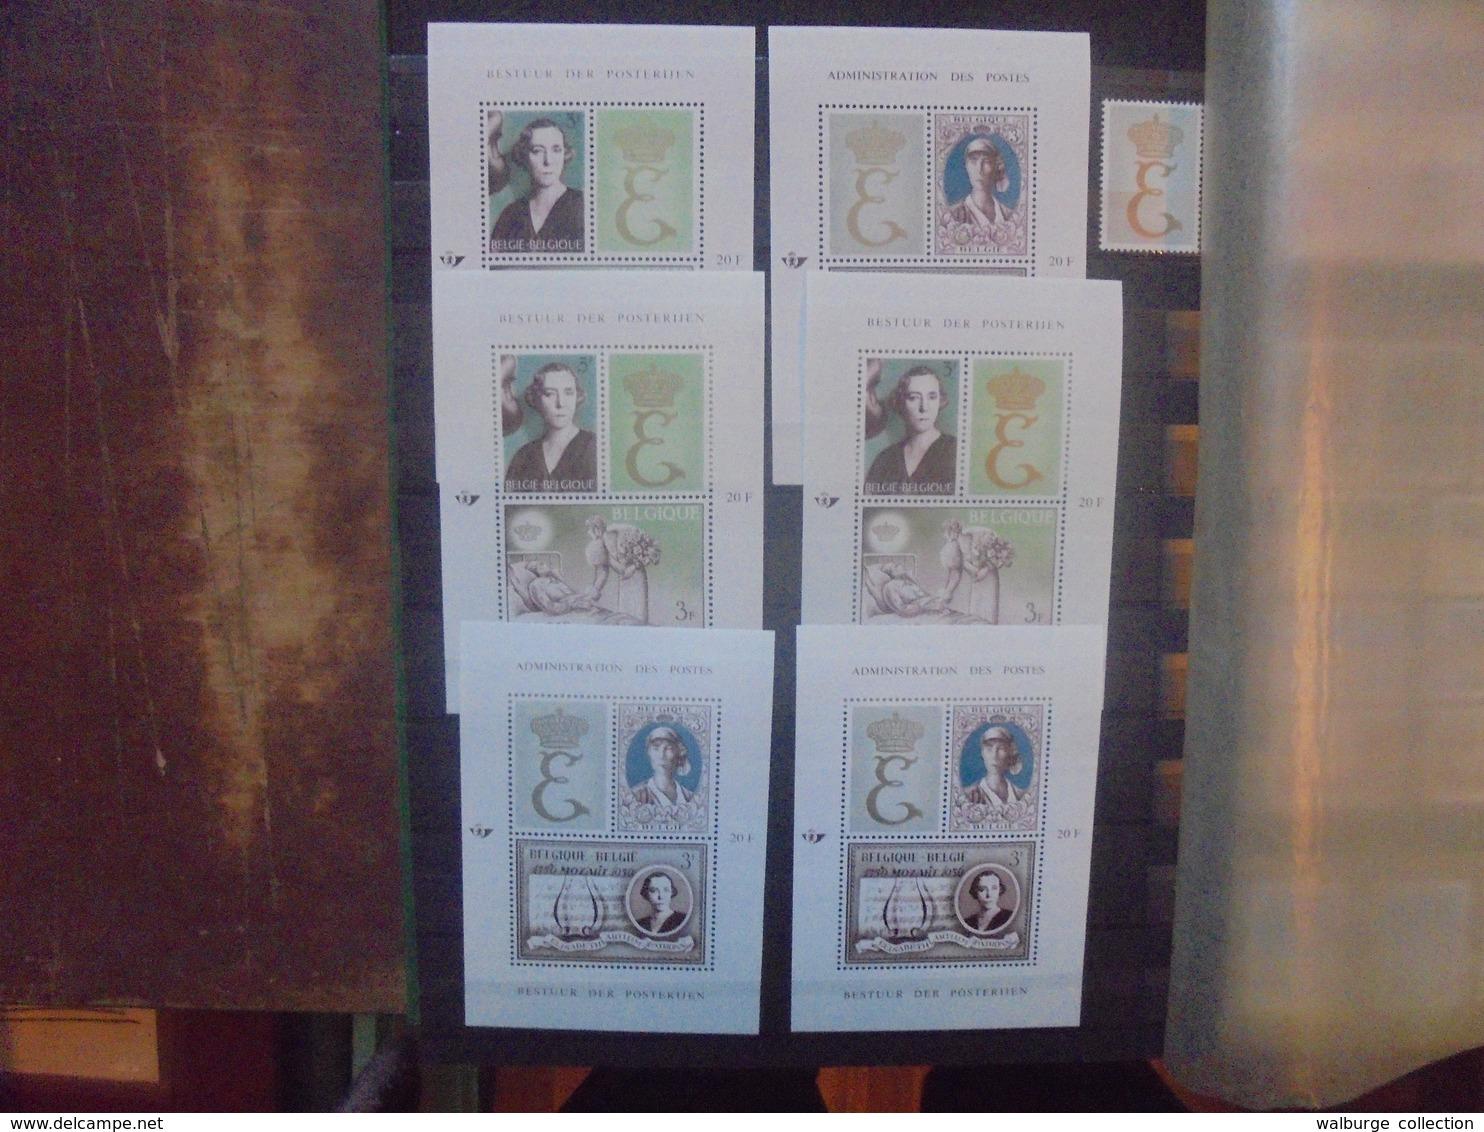 START 1 EURO ! BELGIQUE COLLECTION NEUVE MULTIPLES (2591) 1 KILO 400 - Belgium